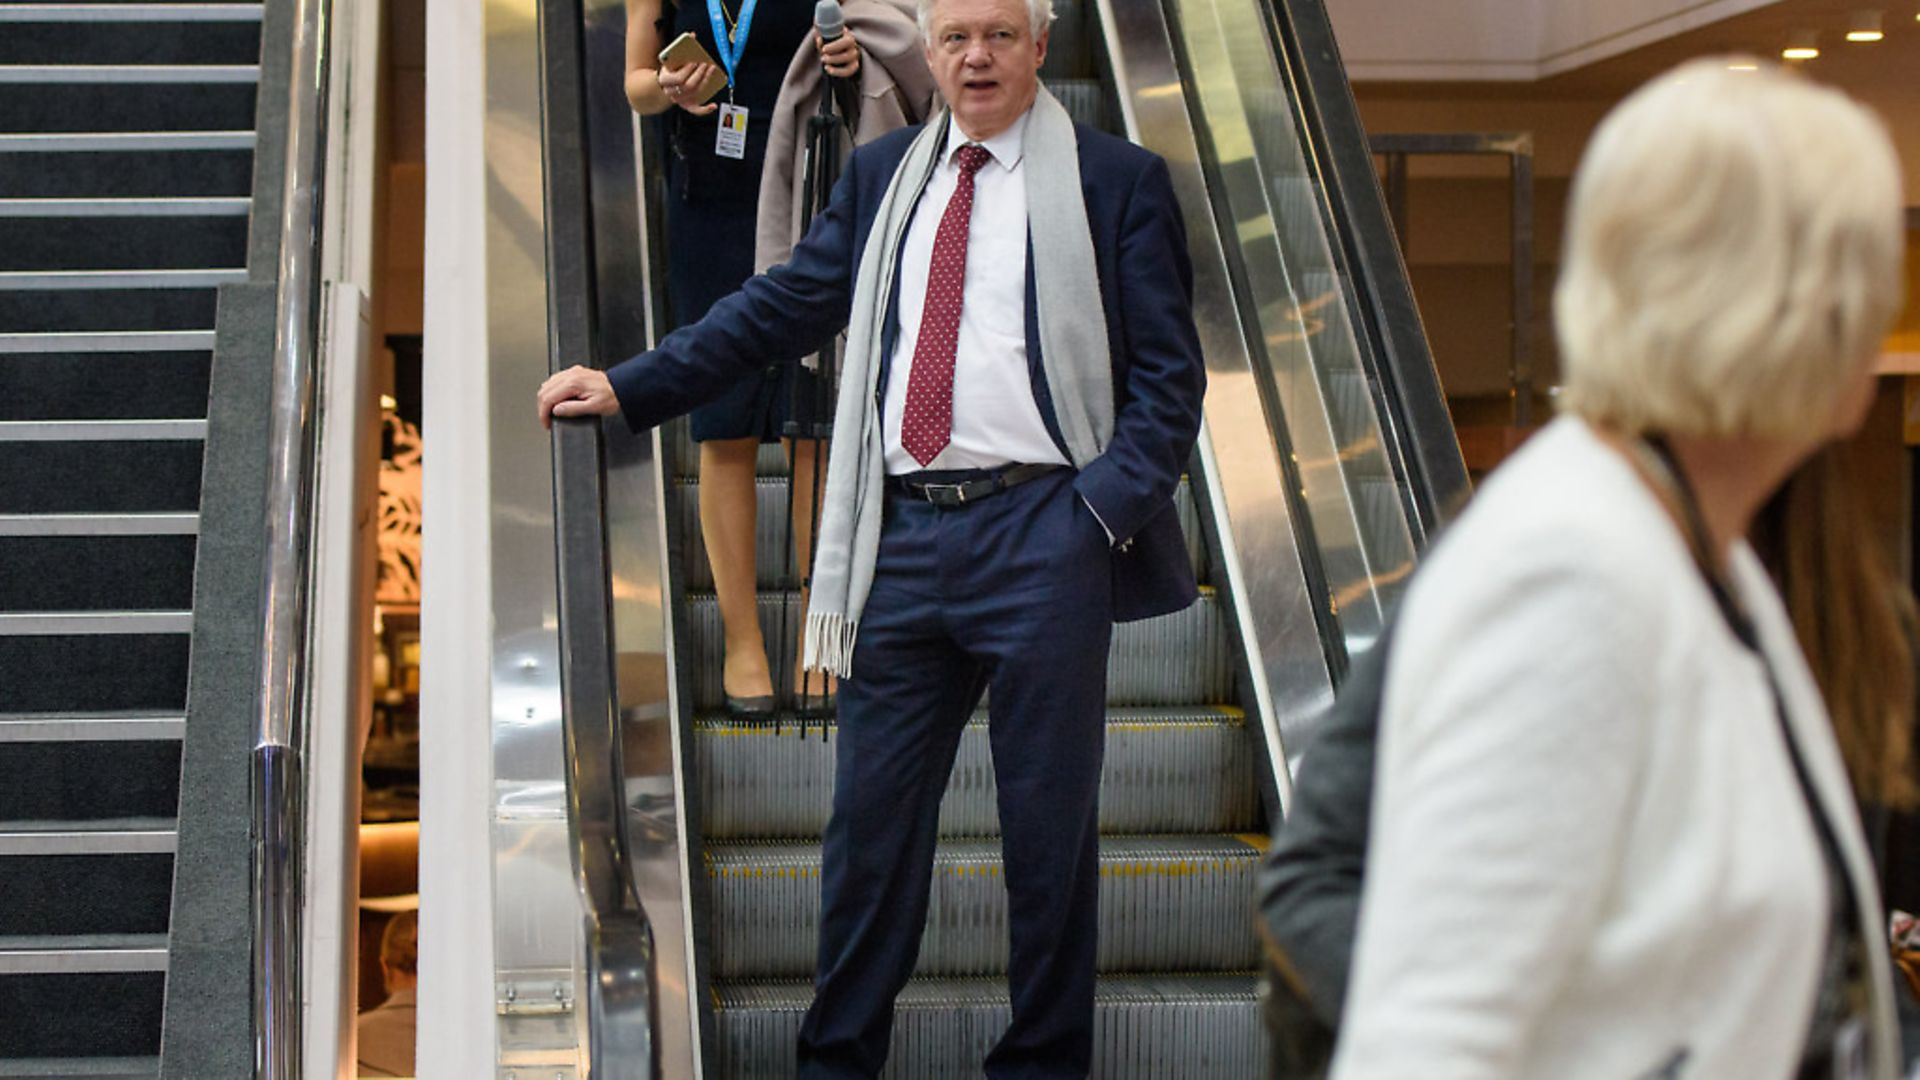 David Davis MP during the Conservative Party annual conference. Photograph: Matt Crossick/EMPICS. - Credit: Empics Entertainment